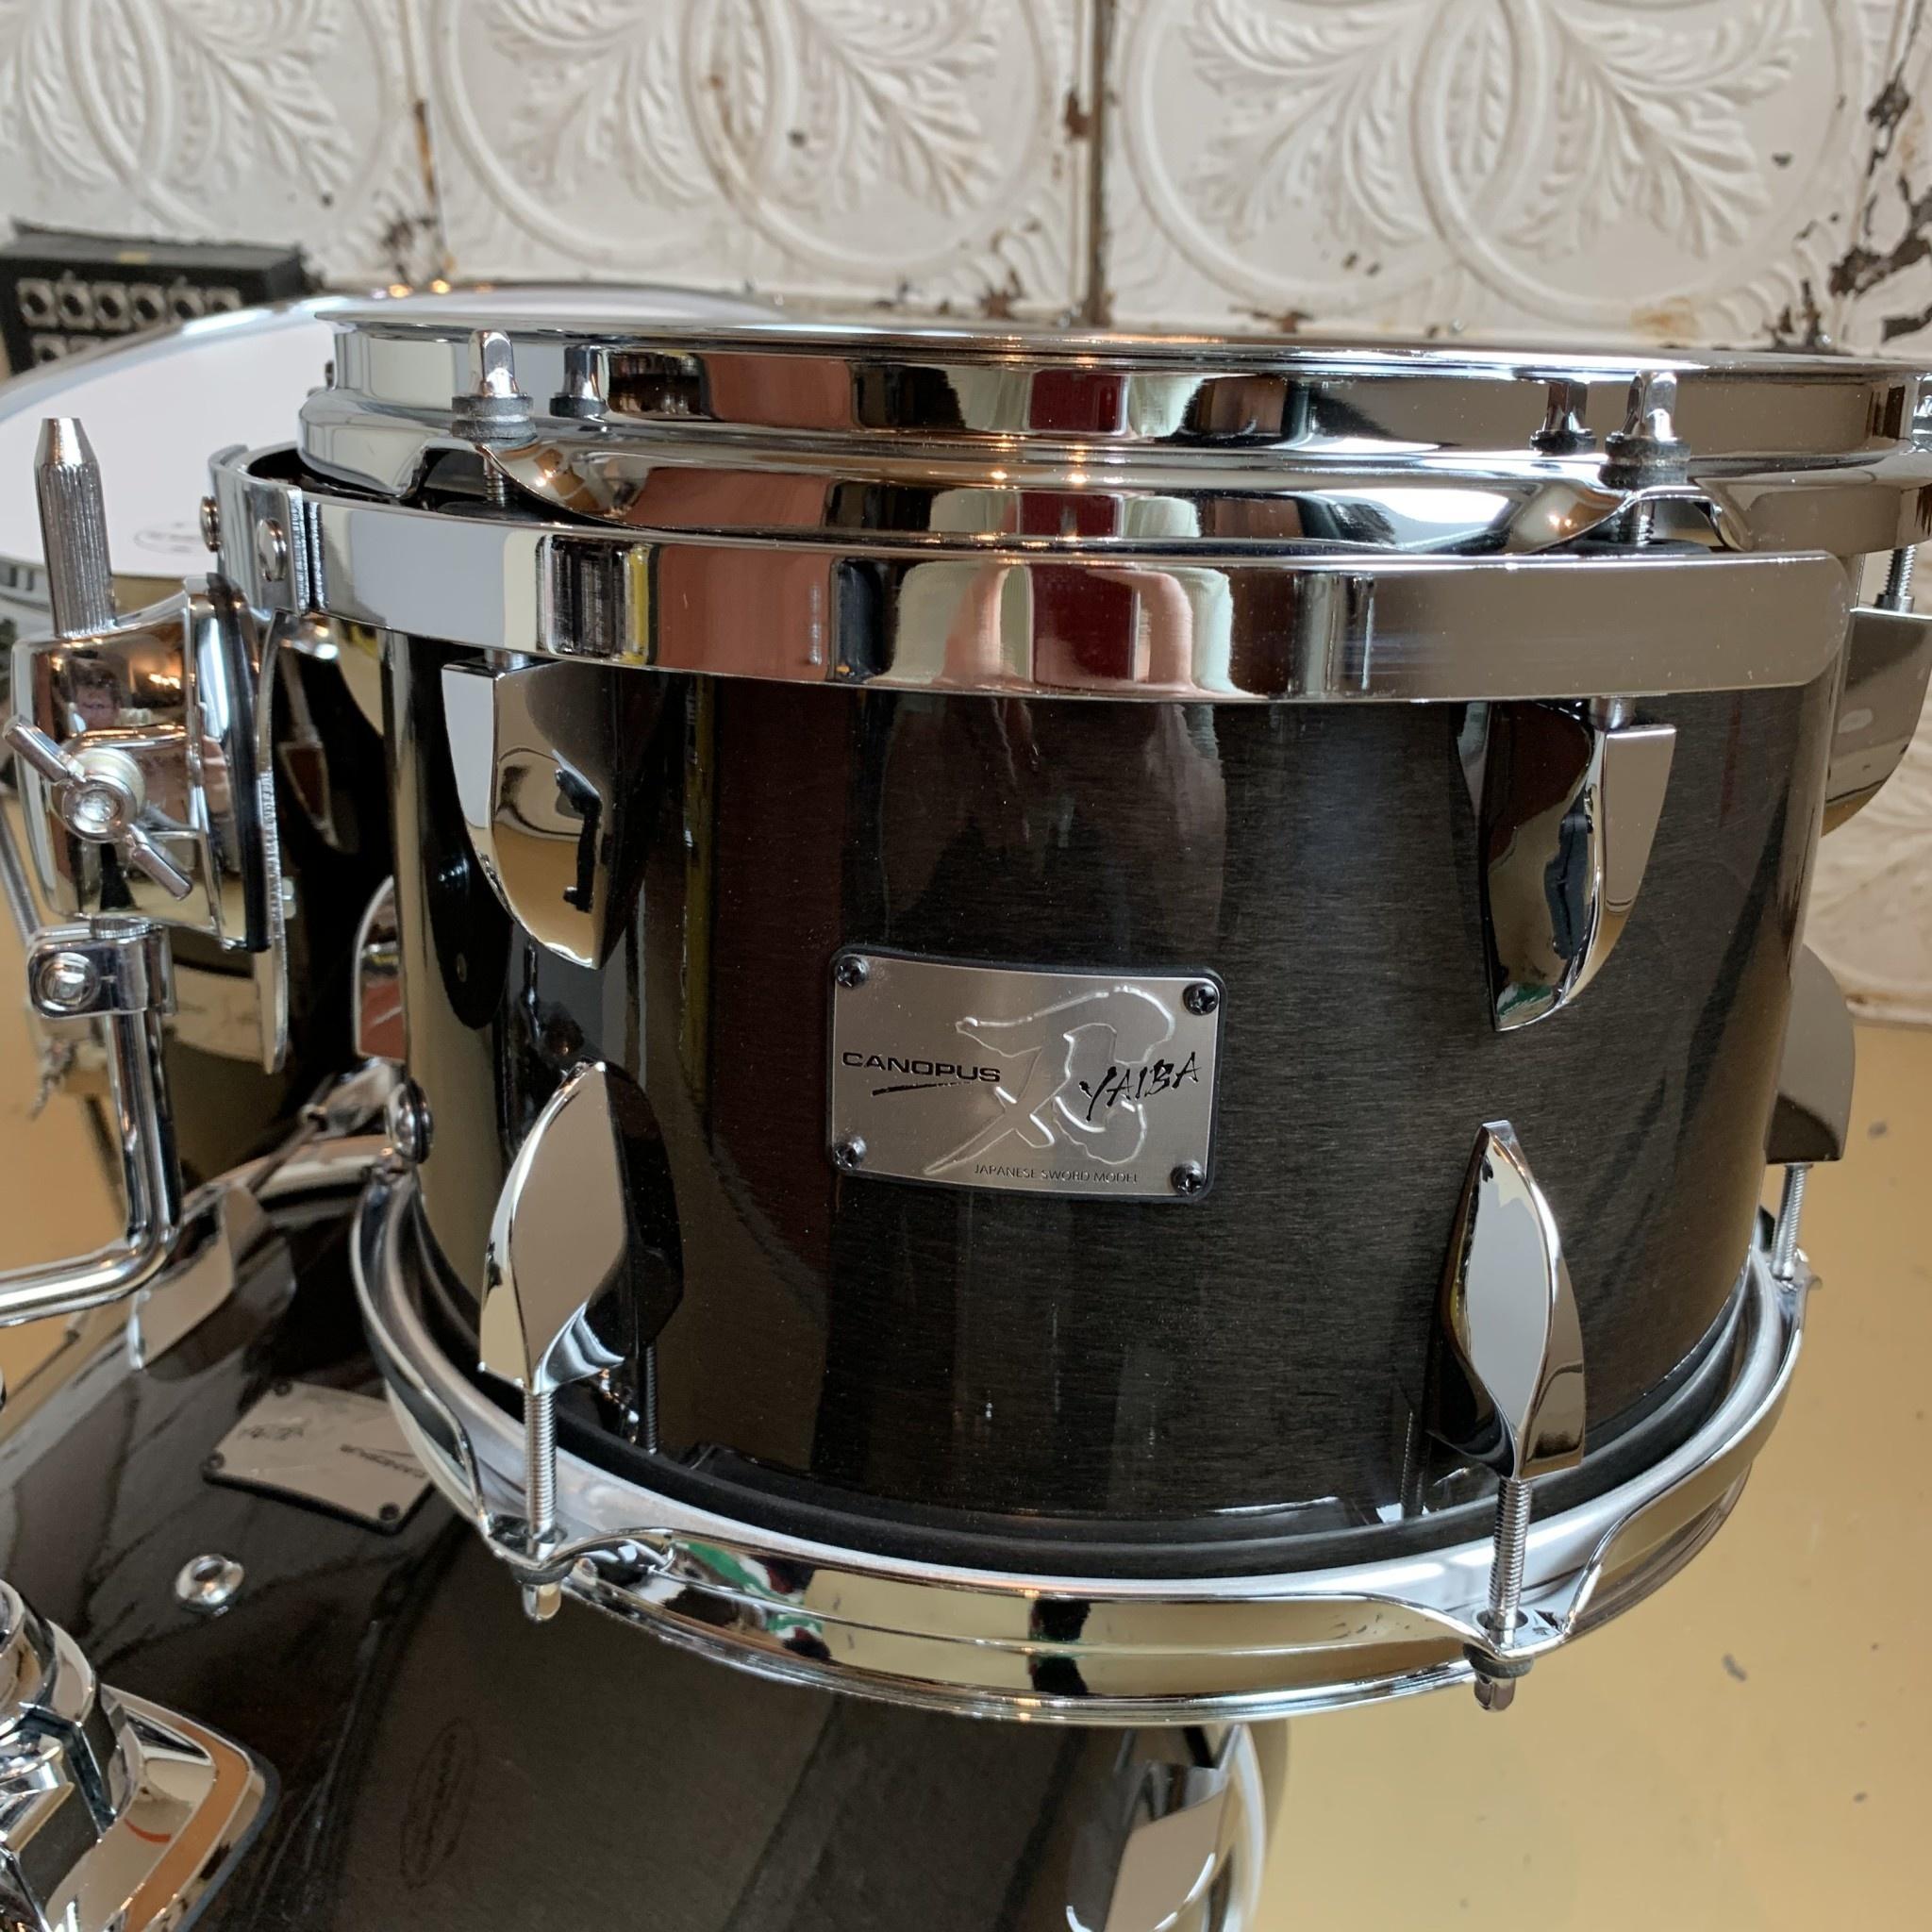 Canopus Drumkit Canopus YAIBA Maple Bob (12, 14, 18) Ebony Gloss Lacquer